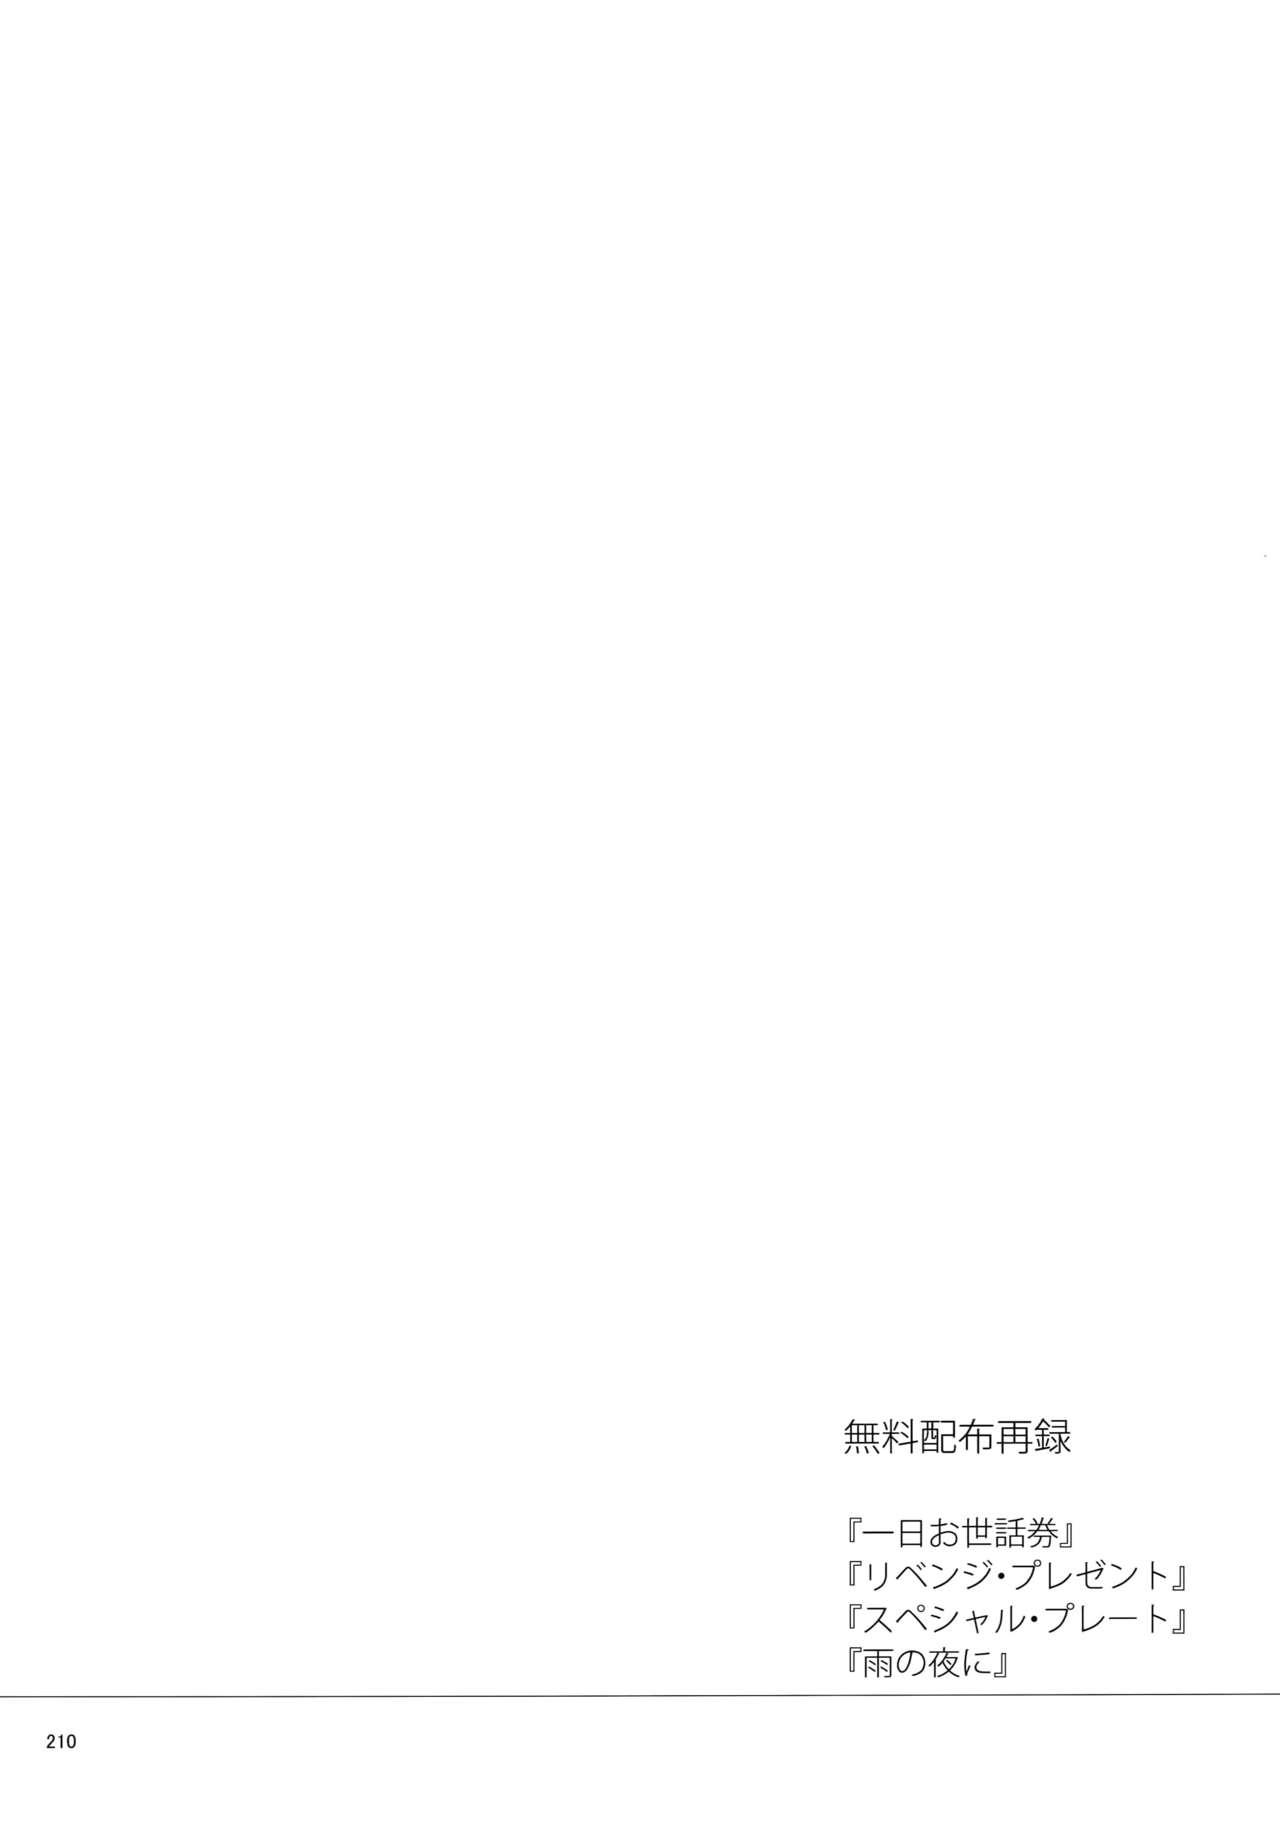 BOROZS Usagi Tora Sairoku 2 208